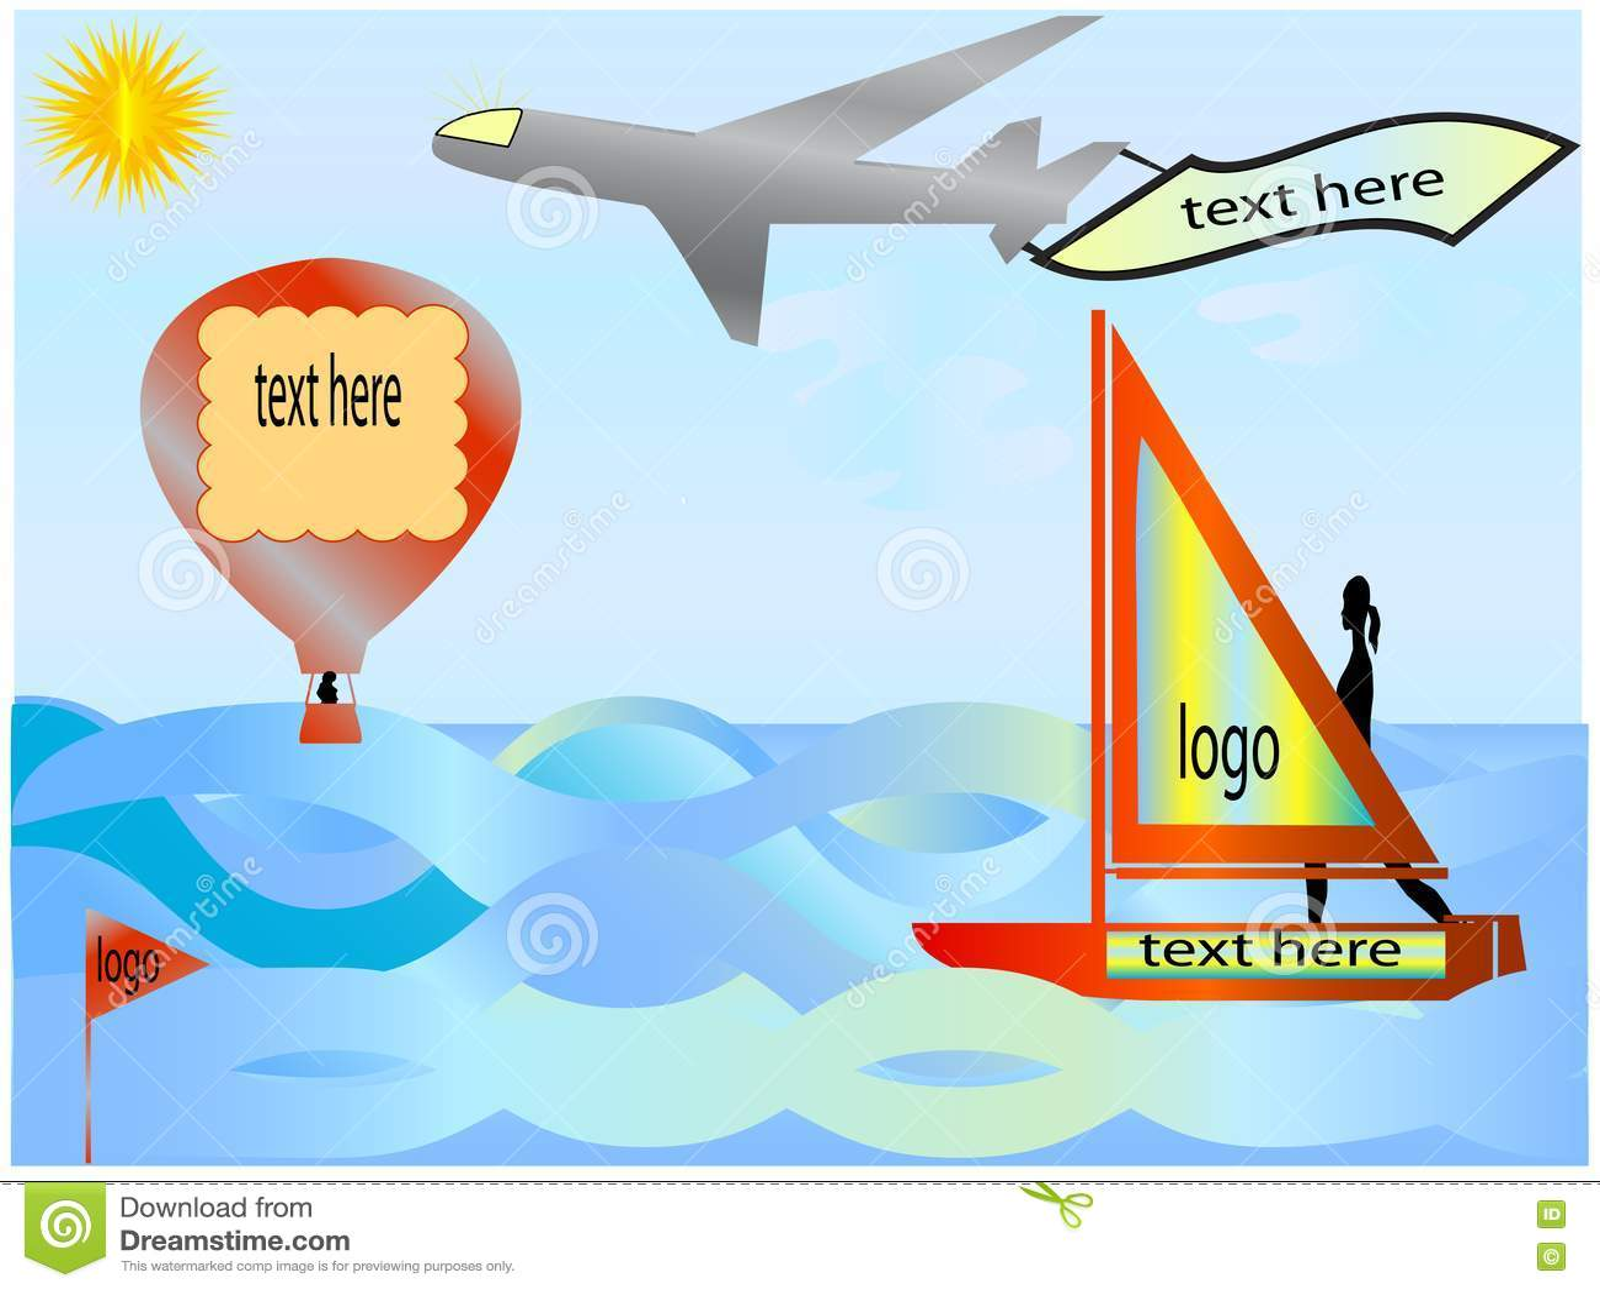 Sailboat, balloon and plane